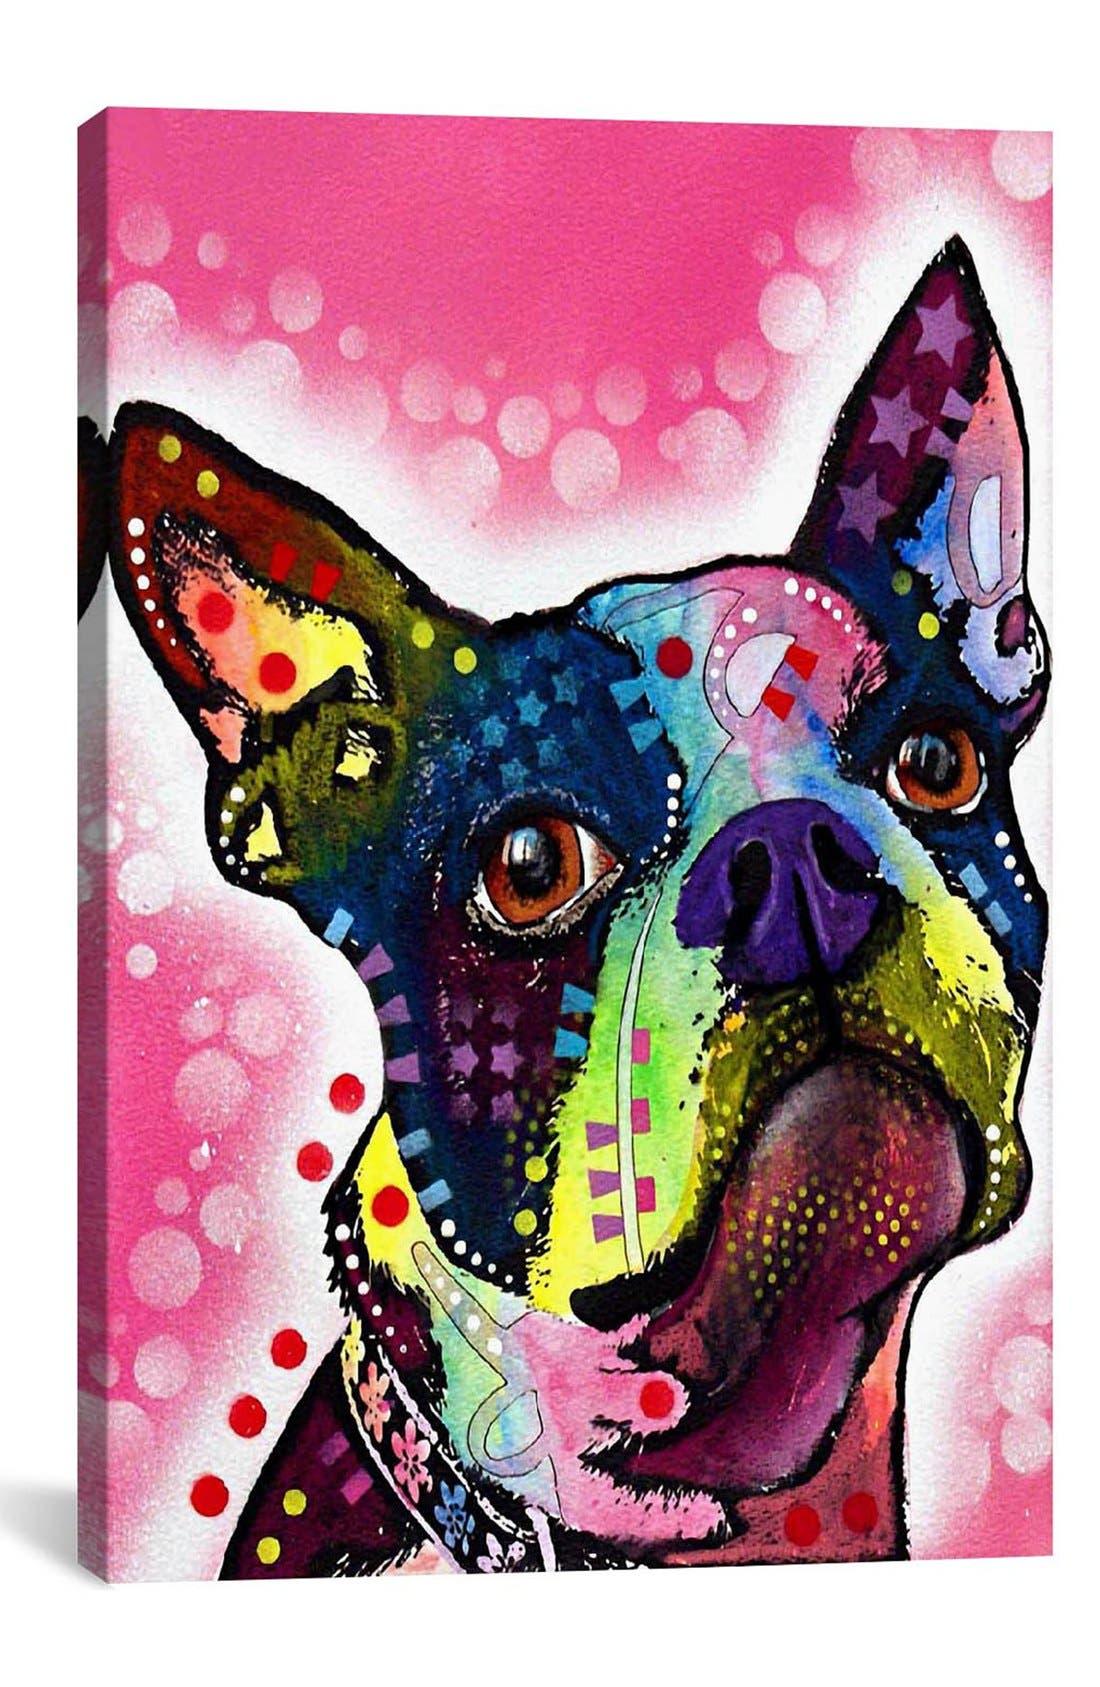 ICANVAS 'Boston Terrier - Dean Russo' Giclée Print